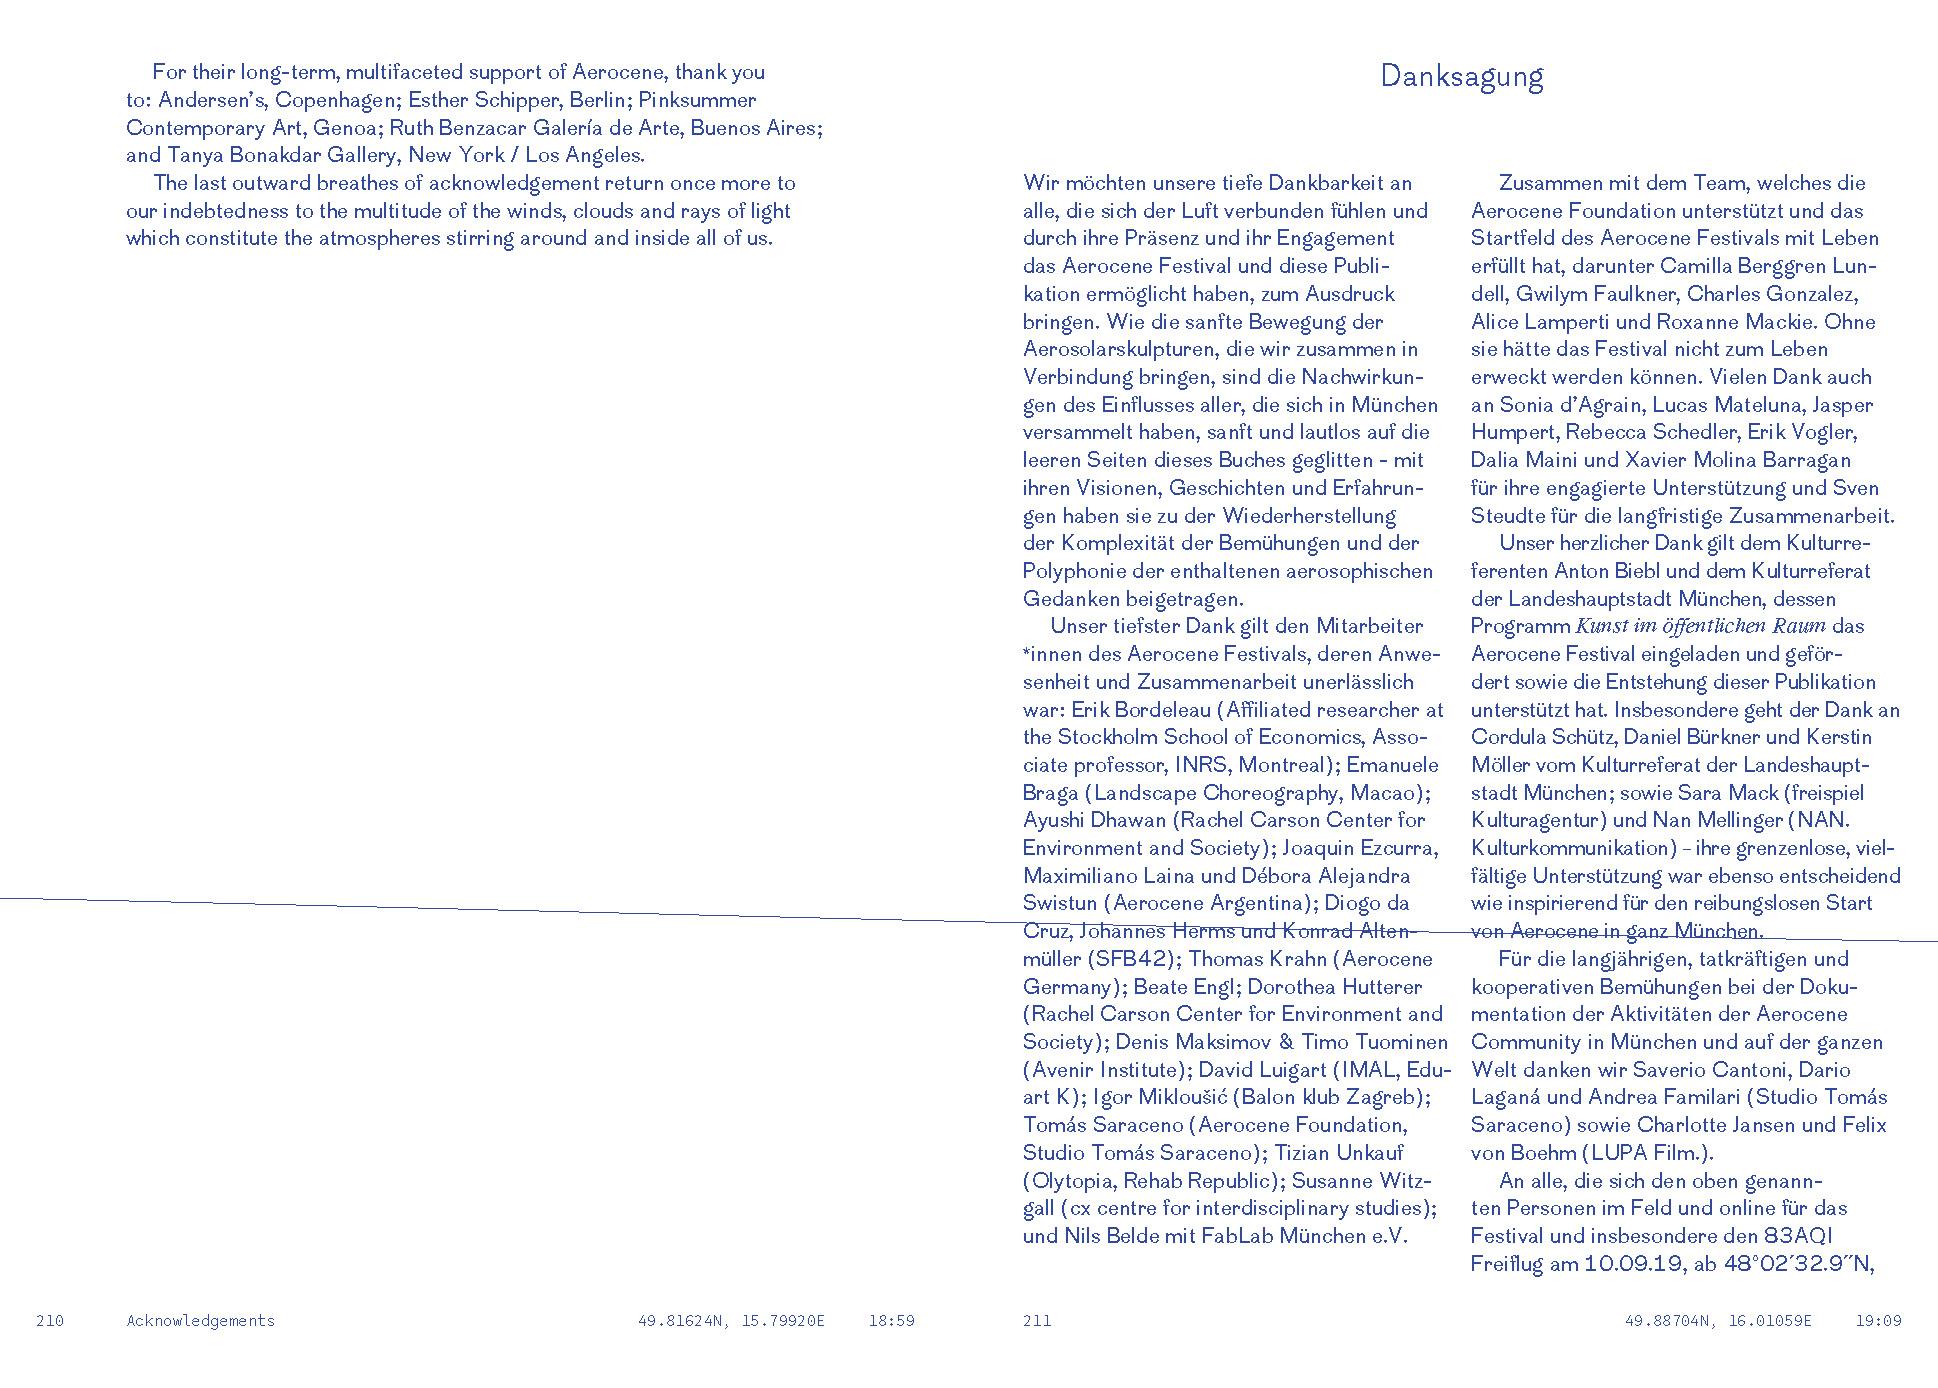 20AE_MovementsfortheAir_Aerocene (1)_Page_106